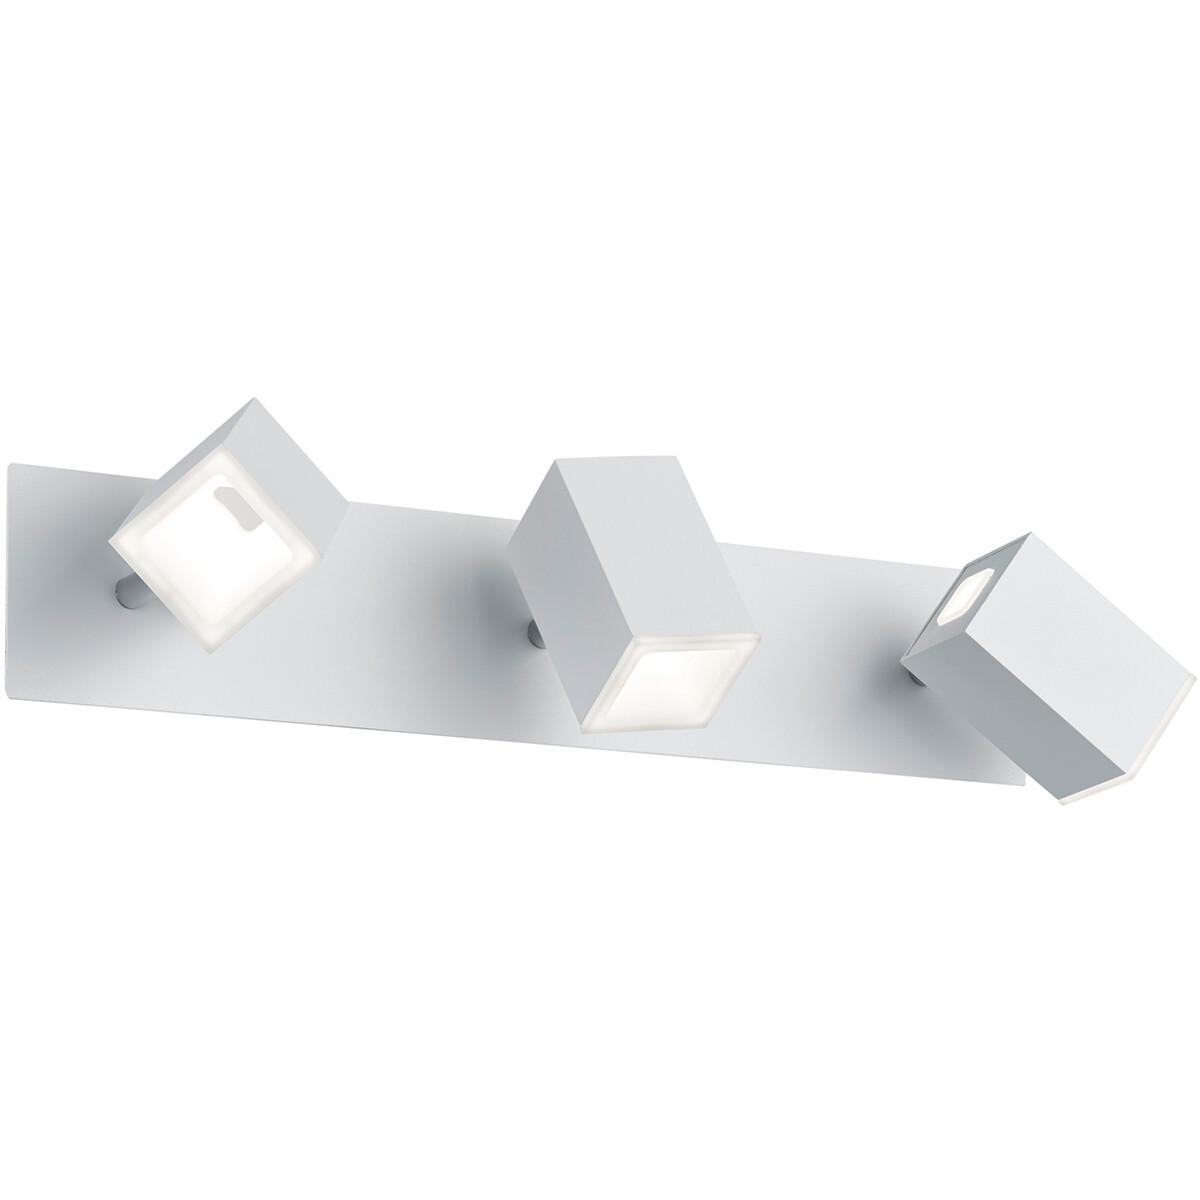 LED Wandspot - Trion Laginos - 18W - Warm Wit 3000K - 3-lichts - Rechthoek - Mat Wit - Aluminium